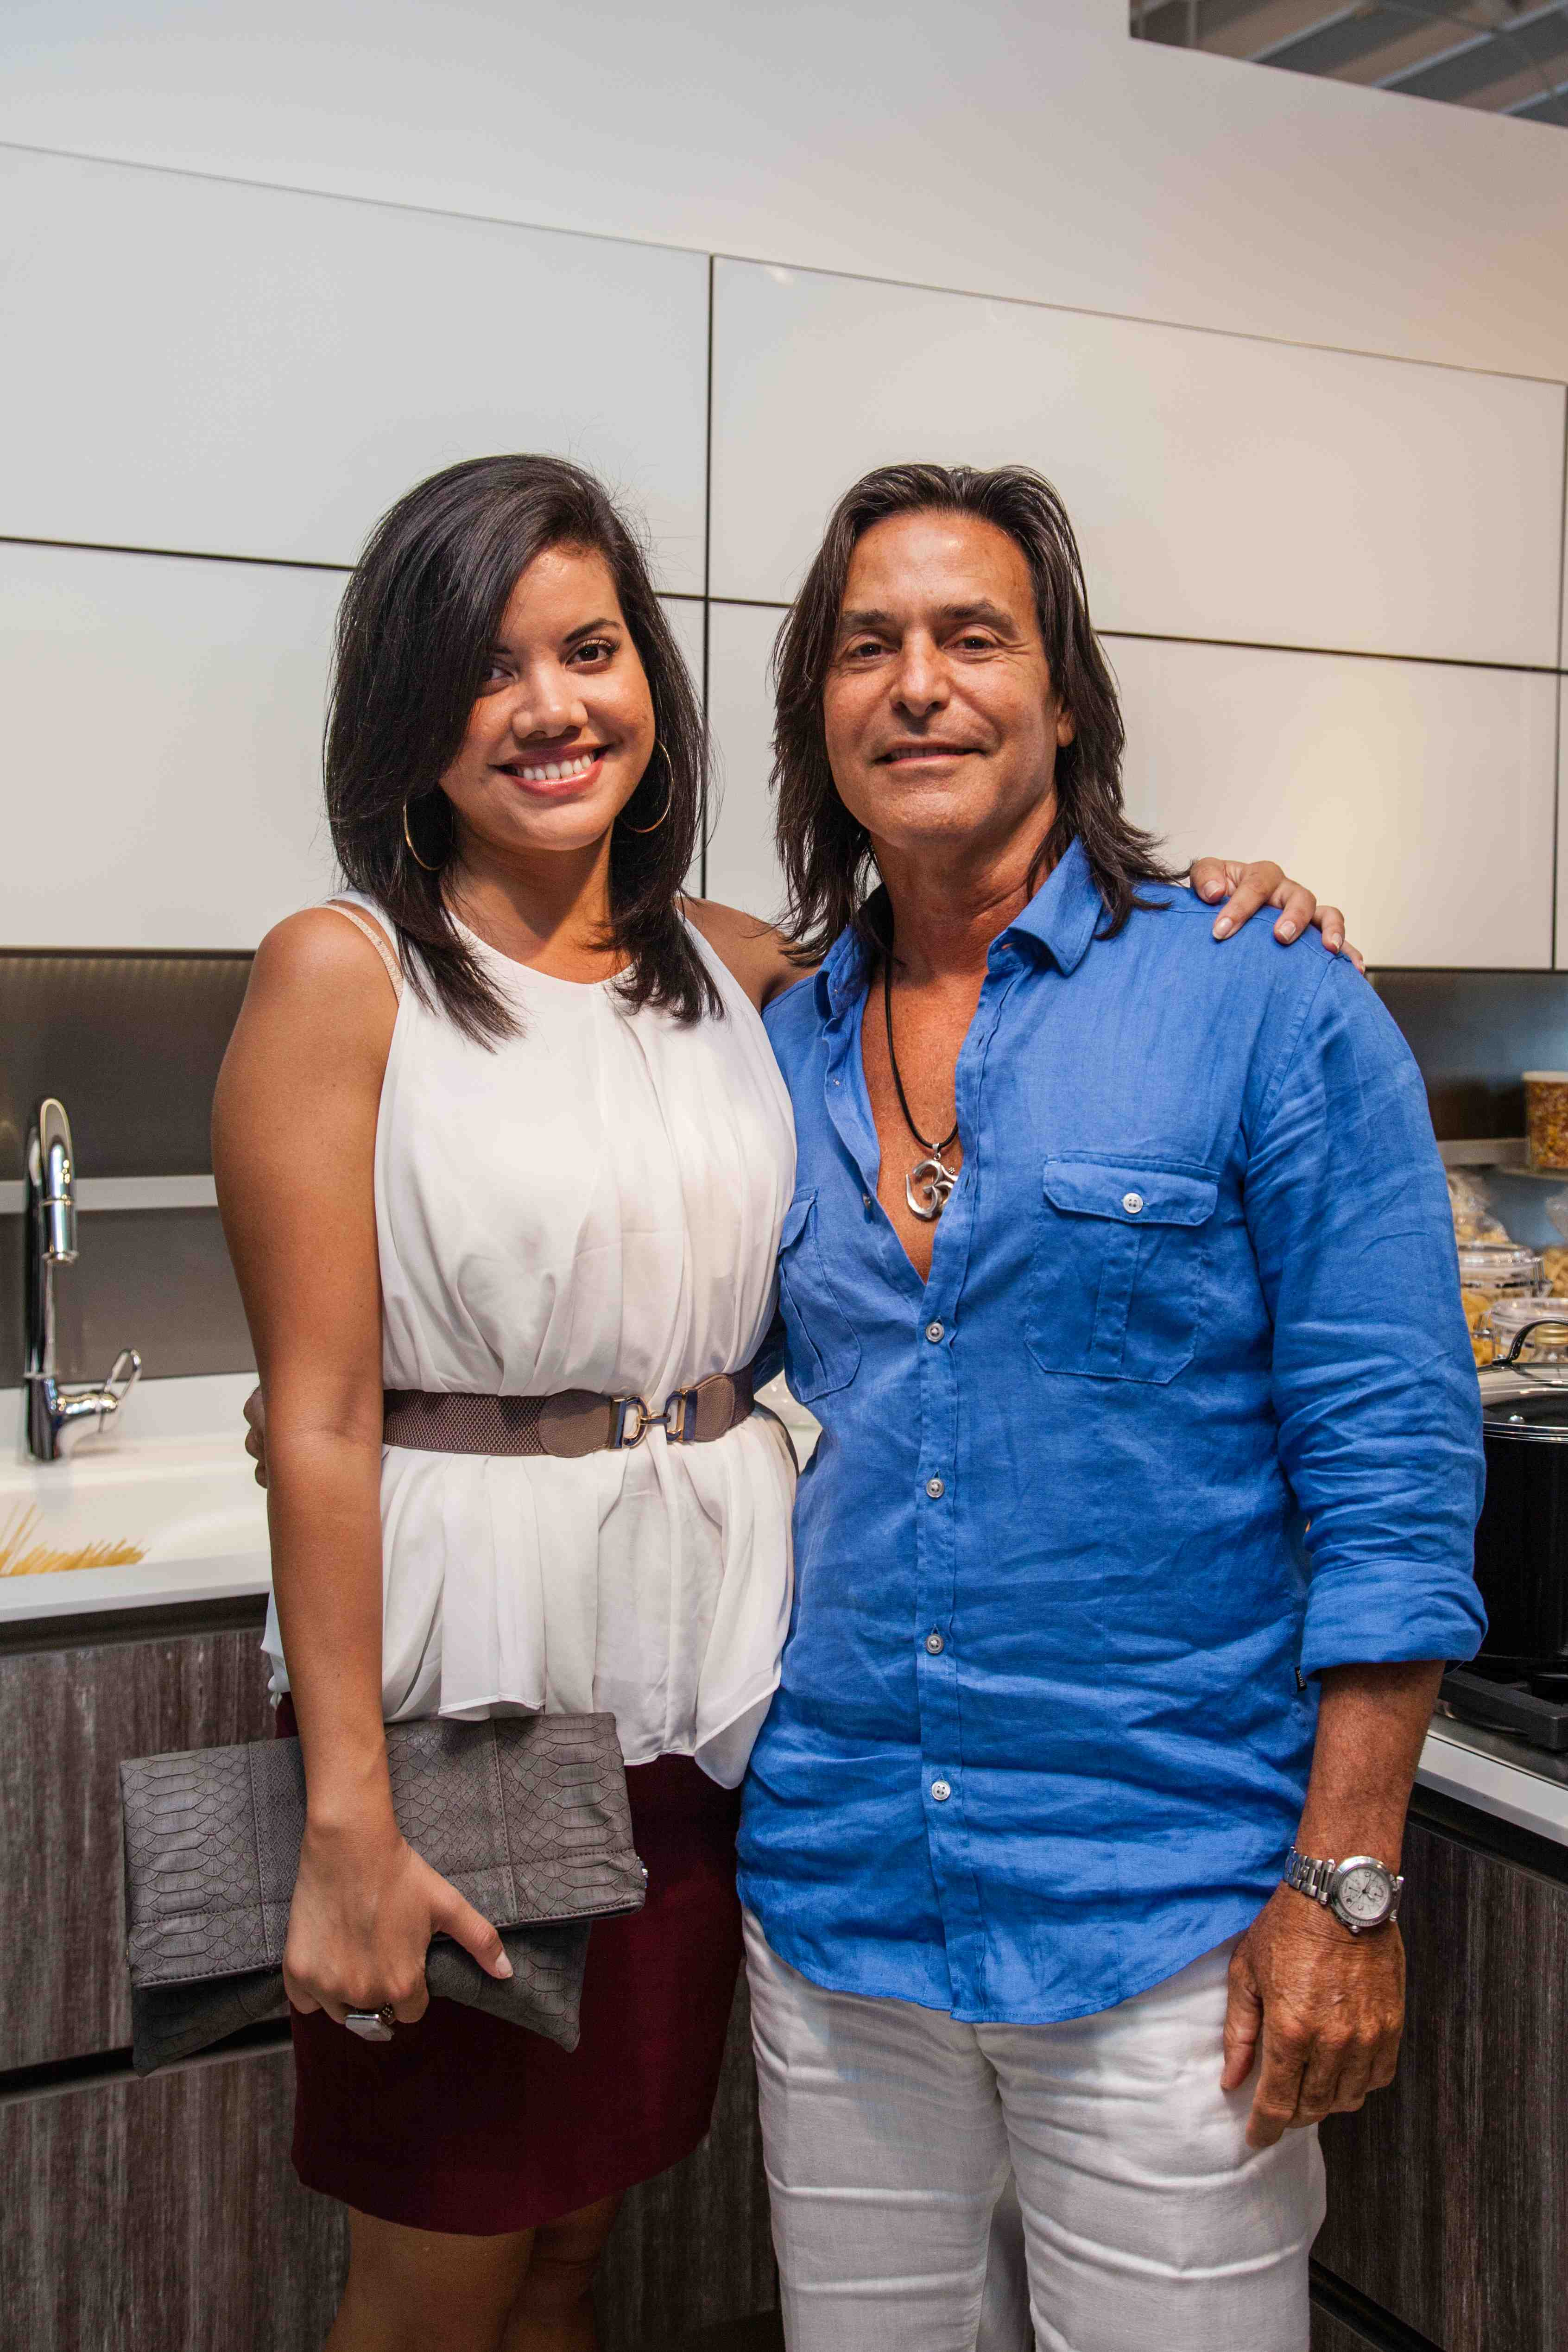 Karina Gonzalez and Pepe Calderin.LOW[2][4]